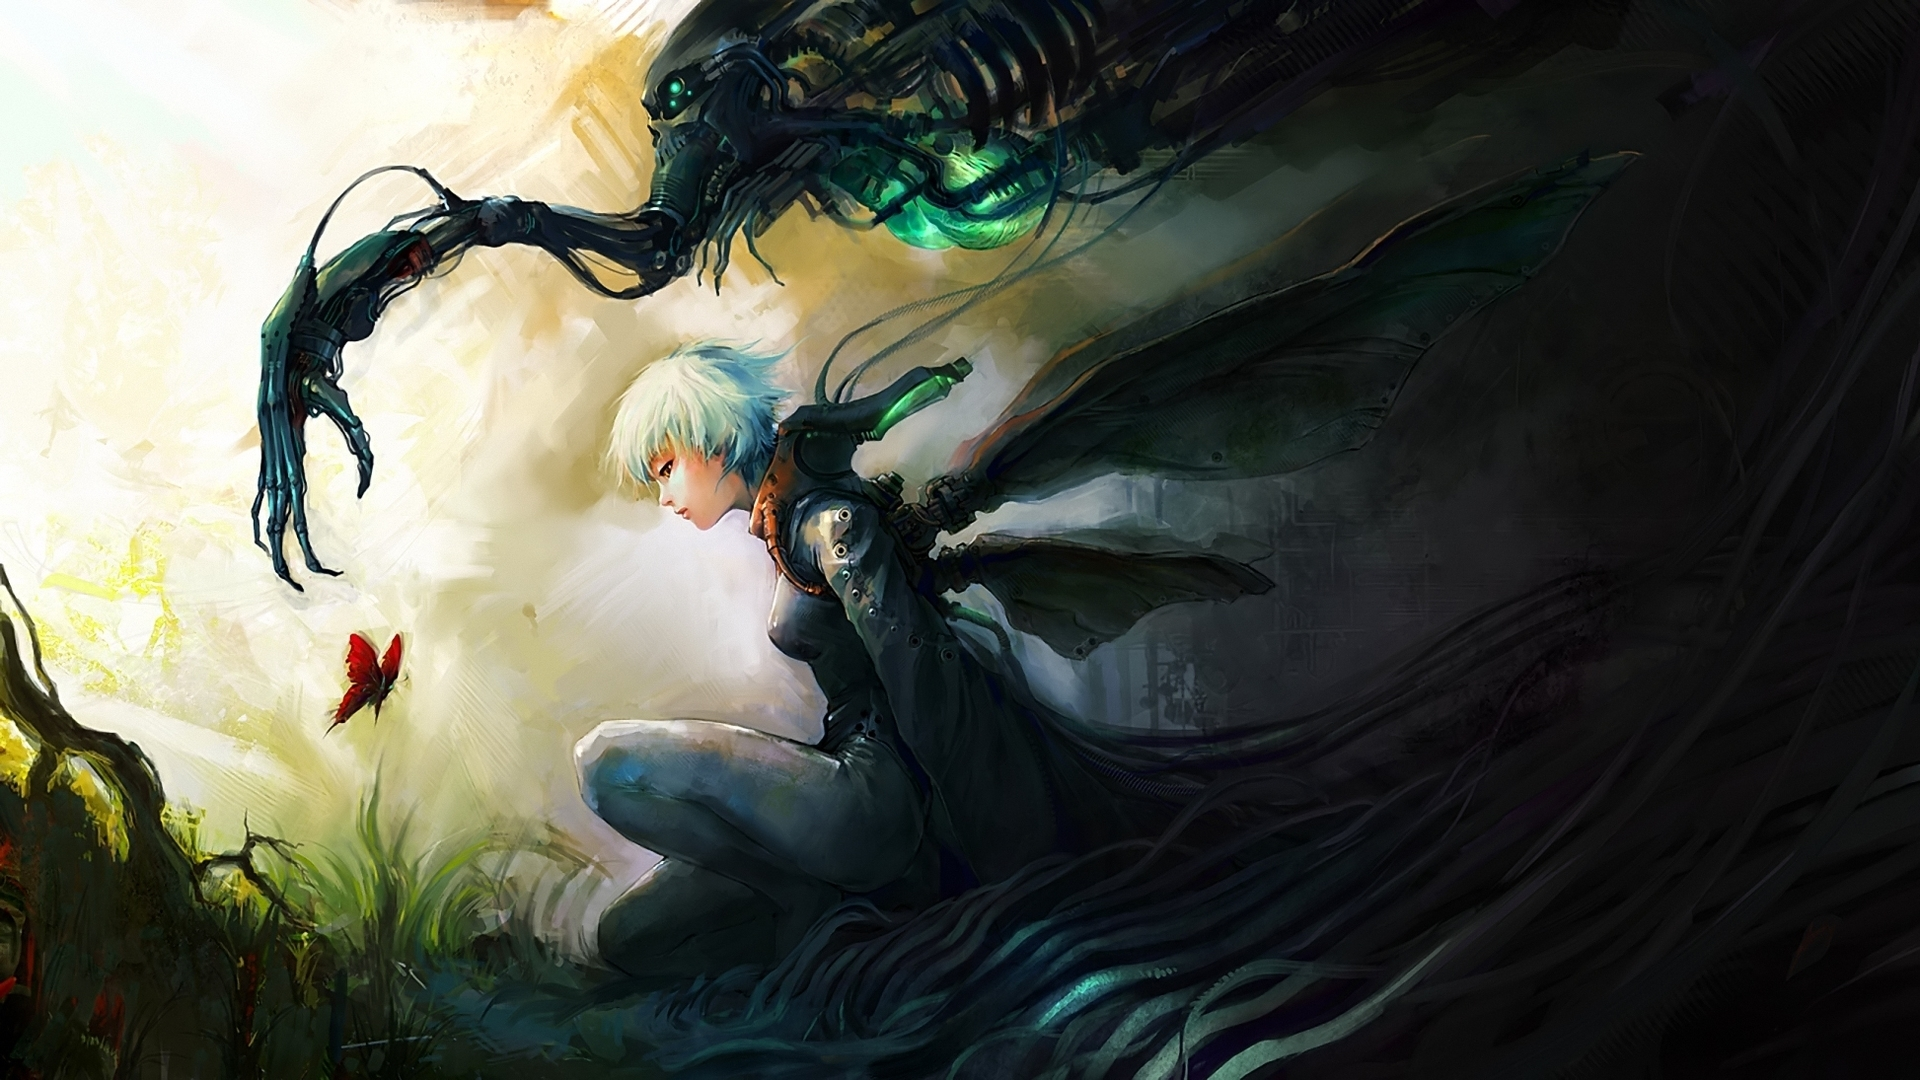 Asuka111 Deviantart Com Paintings Airbrushing Anime Fantasy Cg Digital Art Wallpaper